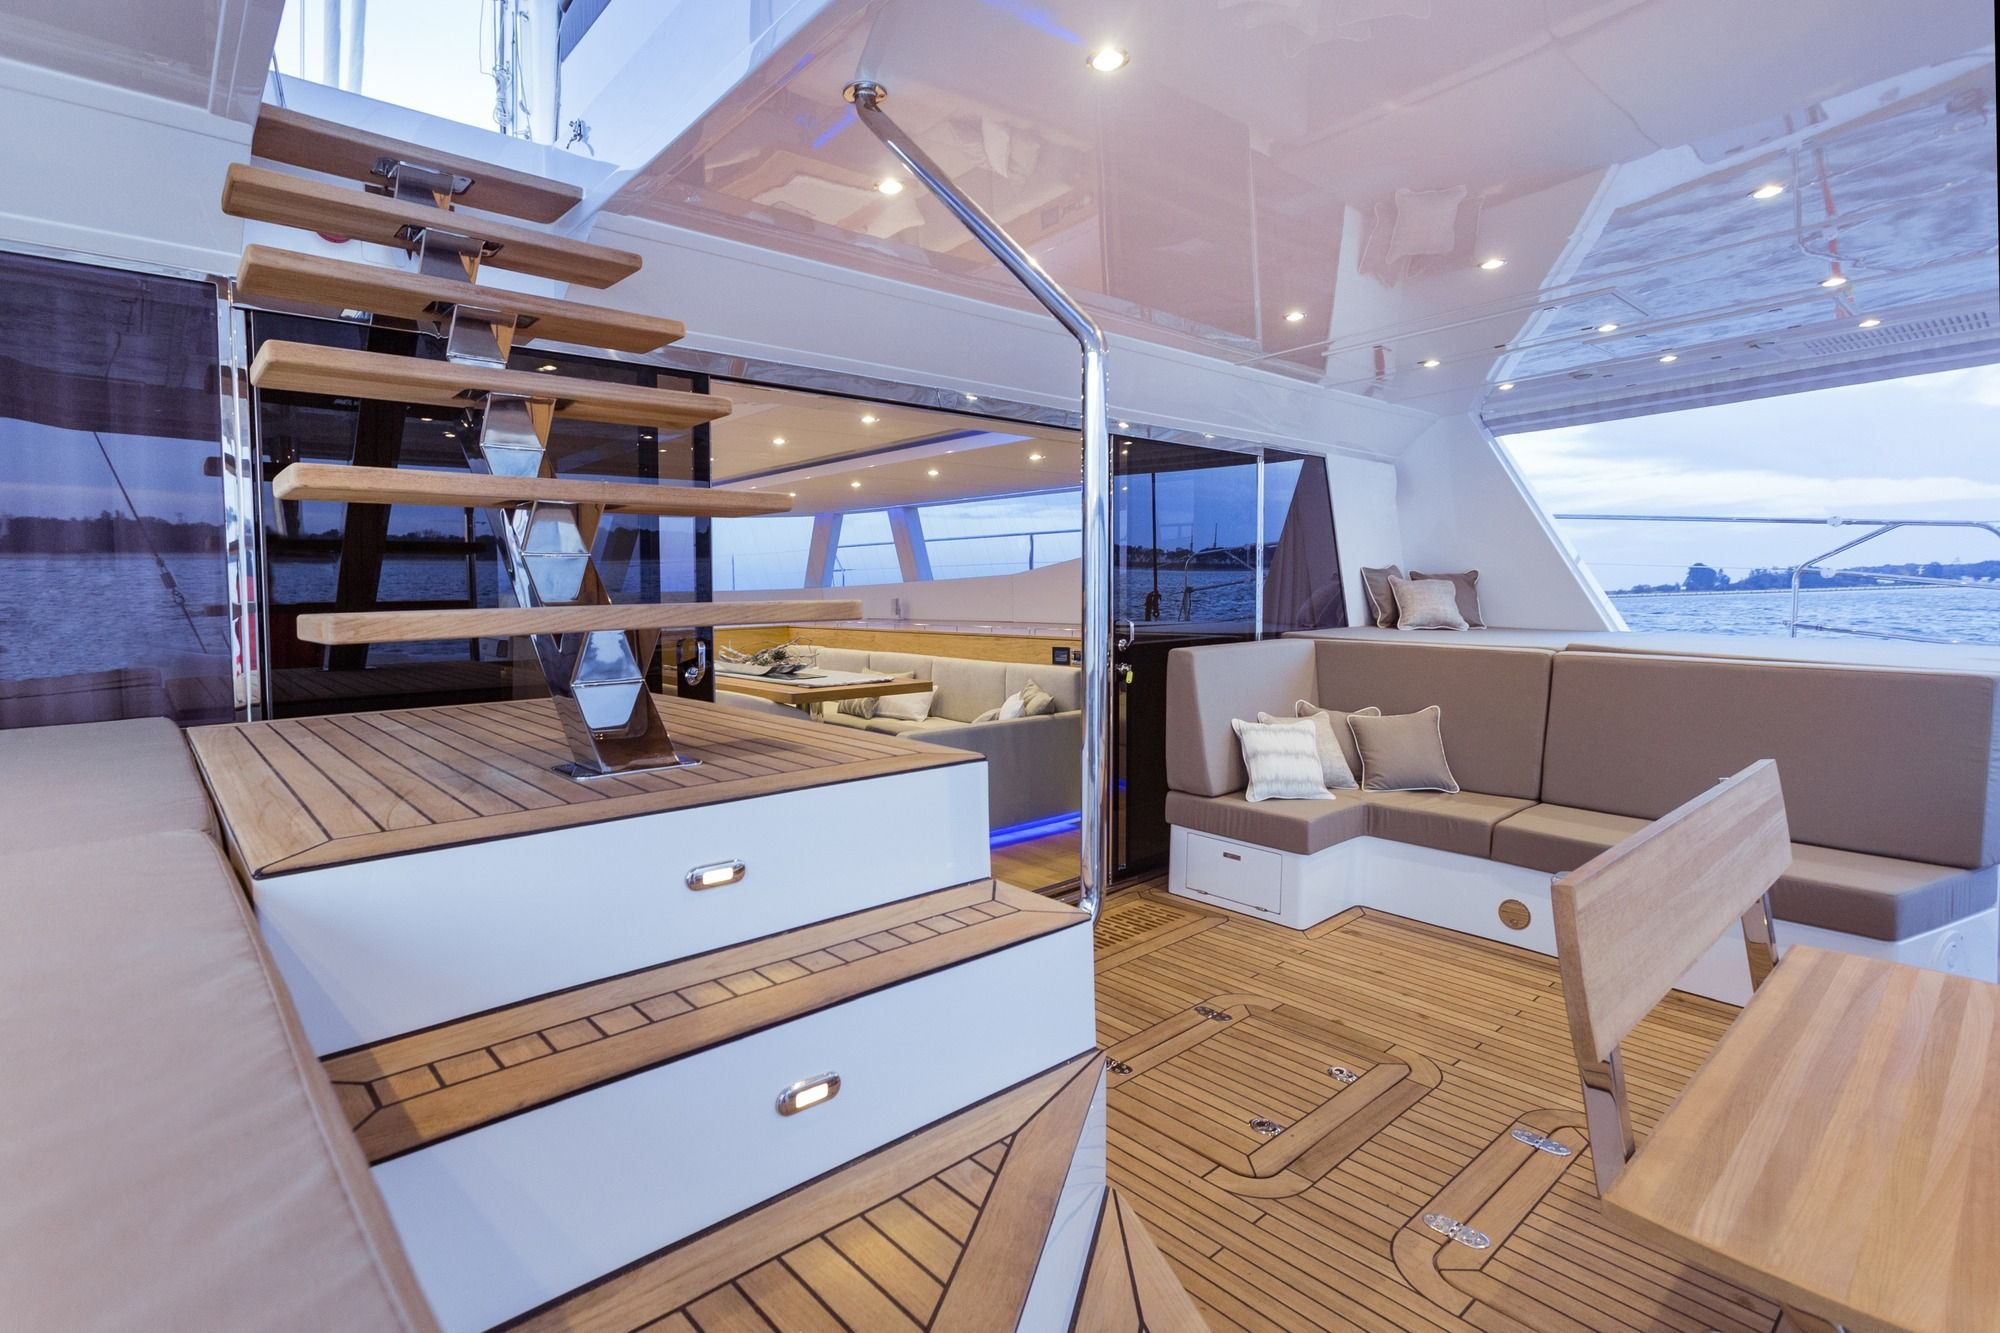 DIANA Sunreef 74 Luxury Catamaran Aft Deck